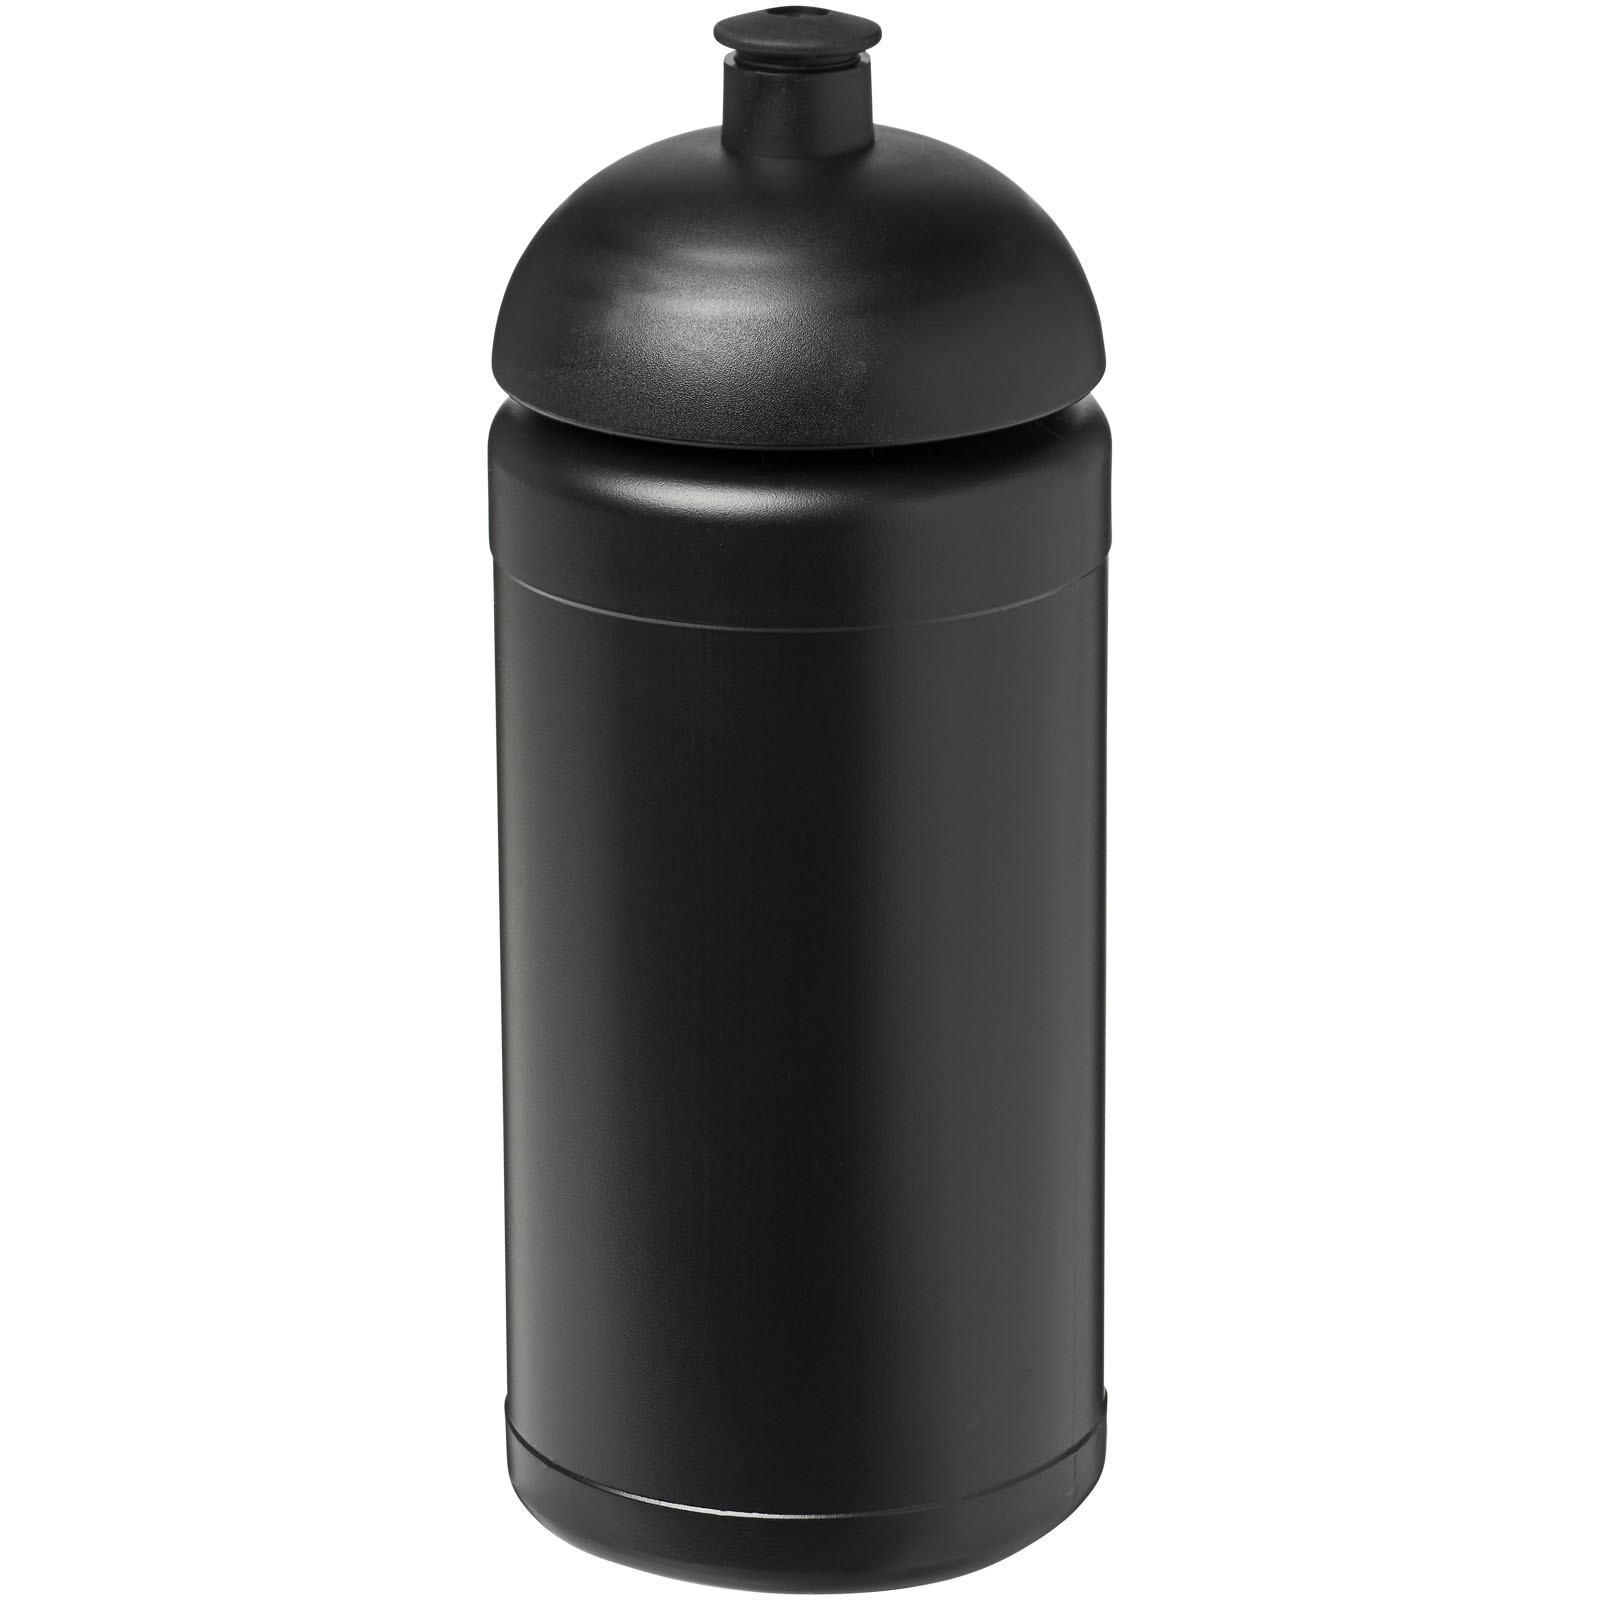 Baseline® Plus 500 ml dome lid sport bottle - Solid black